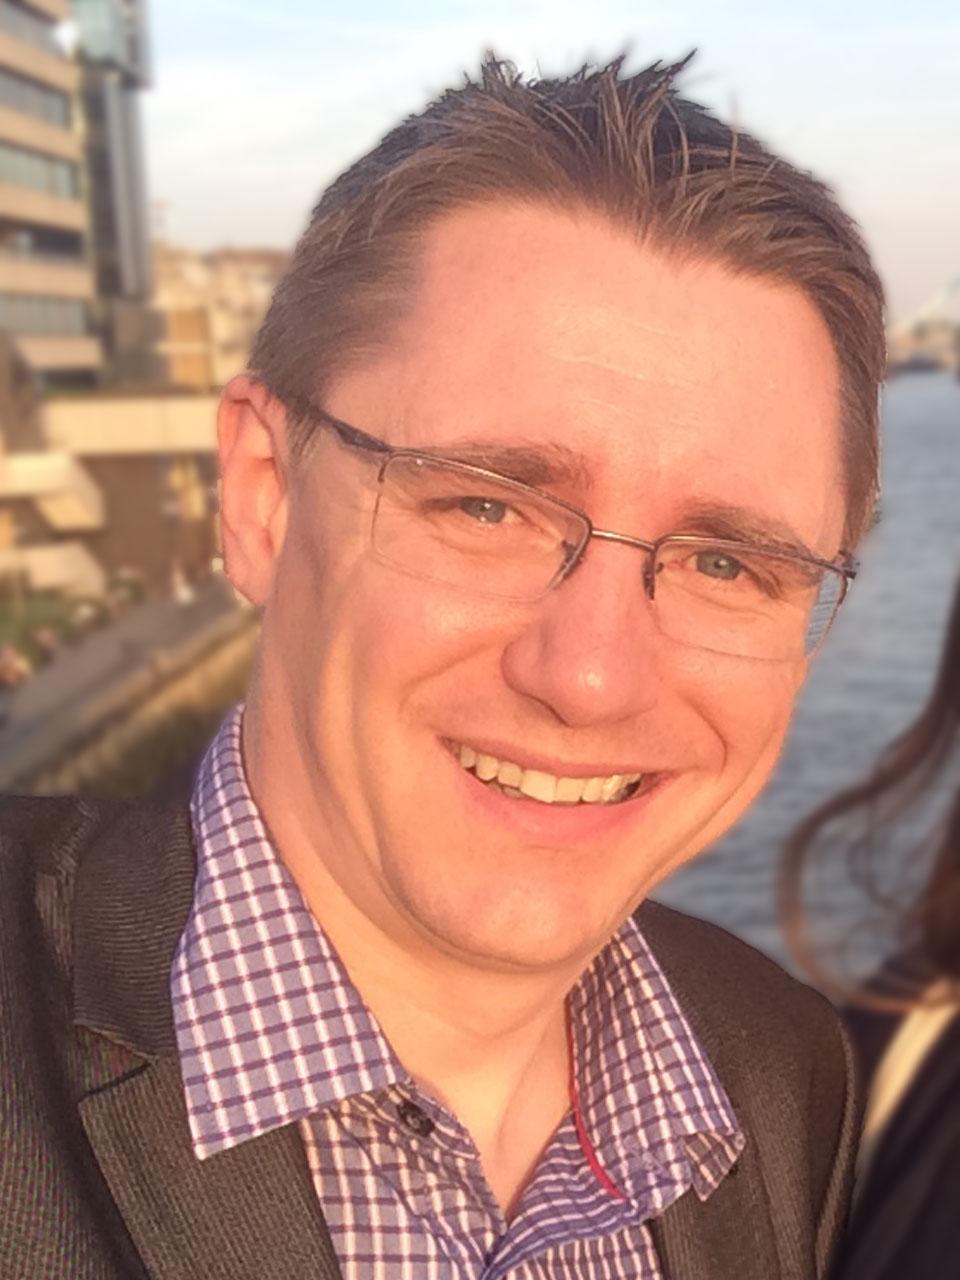 Steve Daly